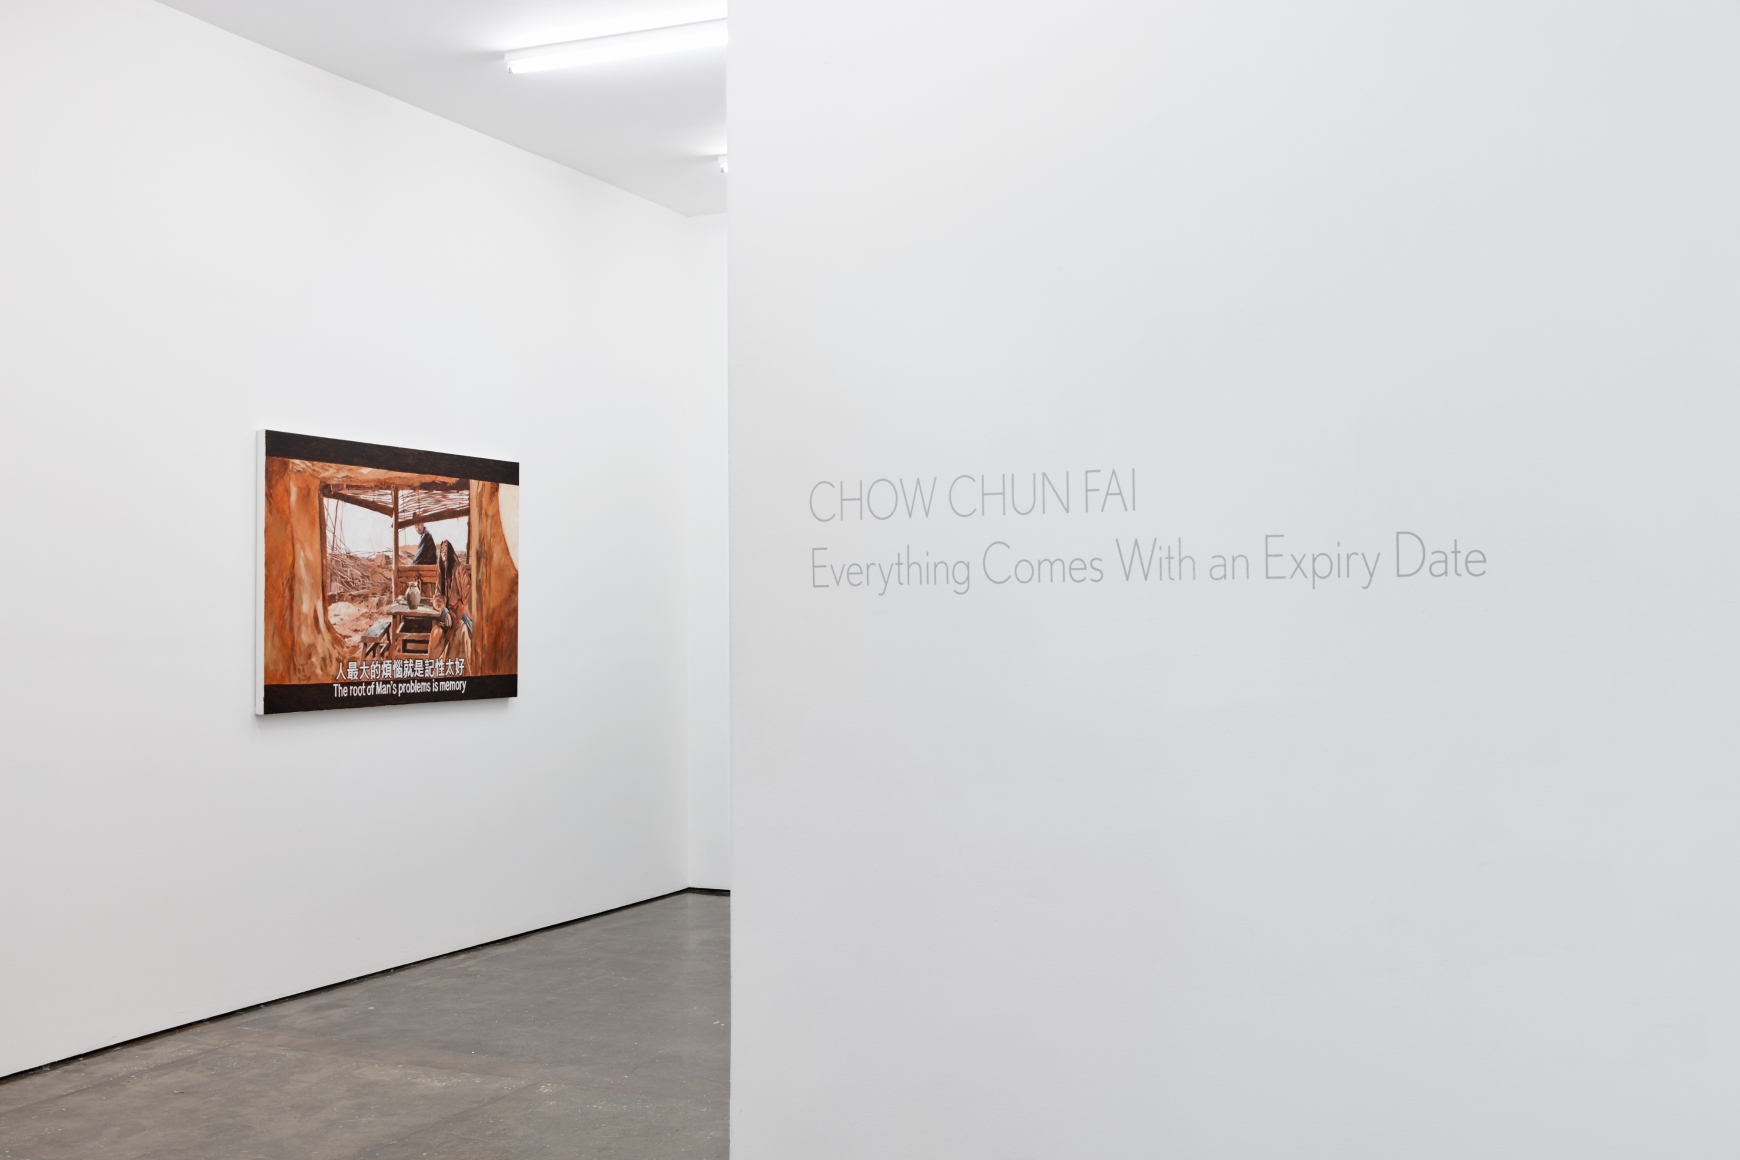 Interior Design Fai Da Te chow chun fai: everything comes with an expiry date